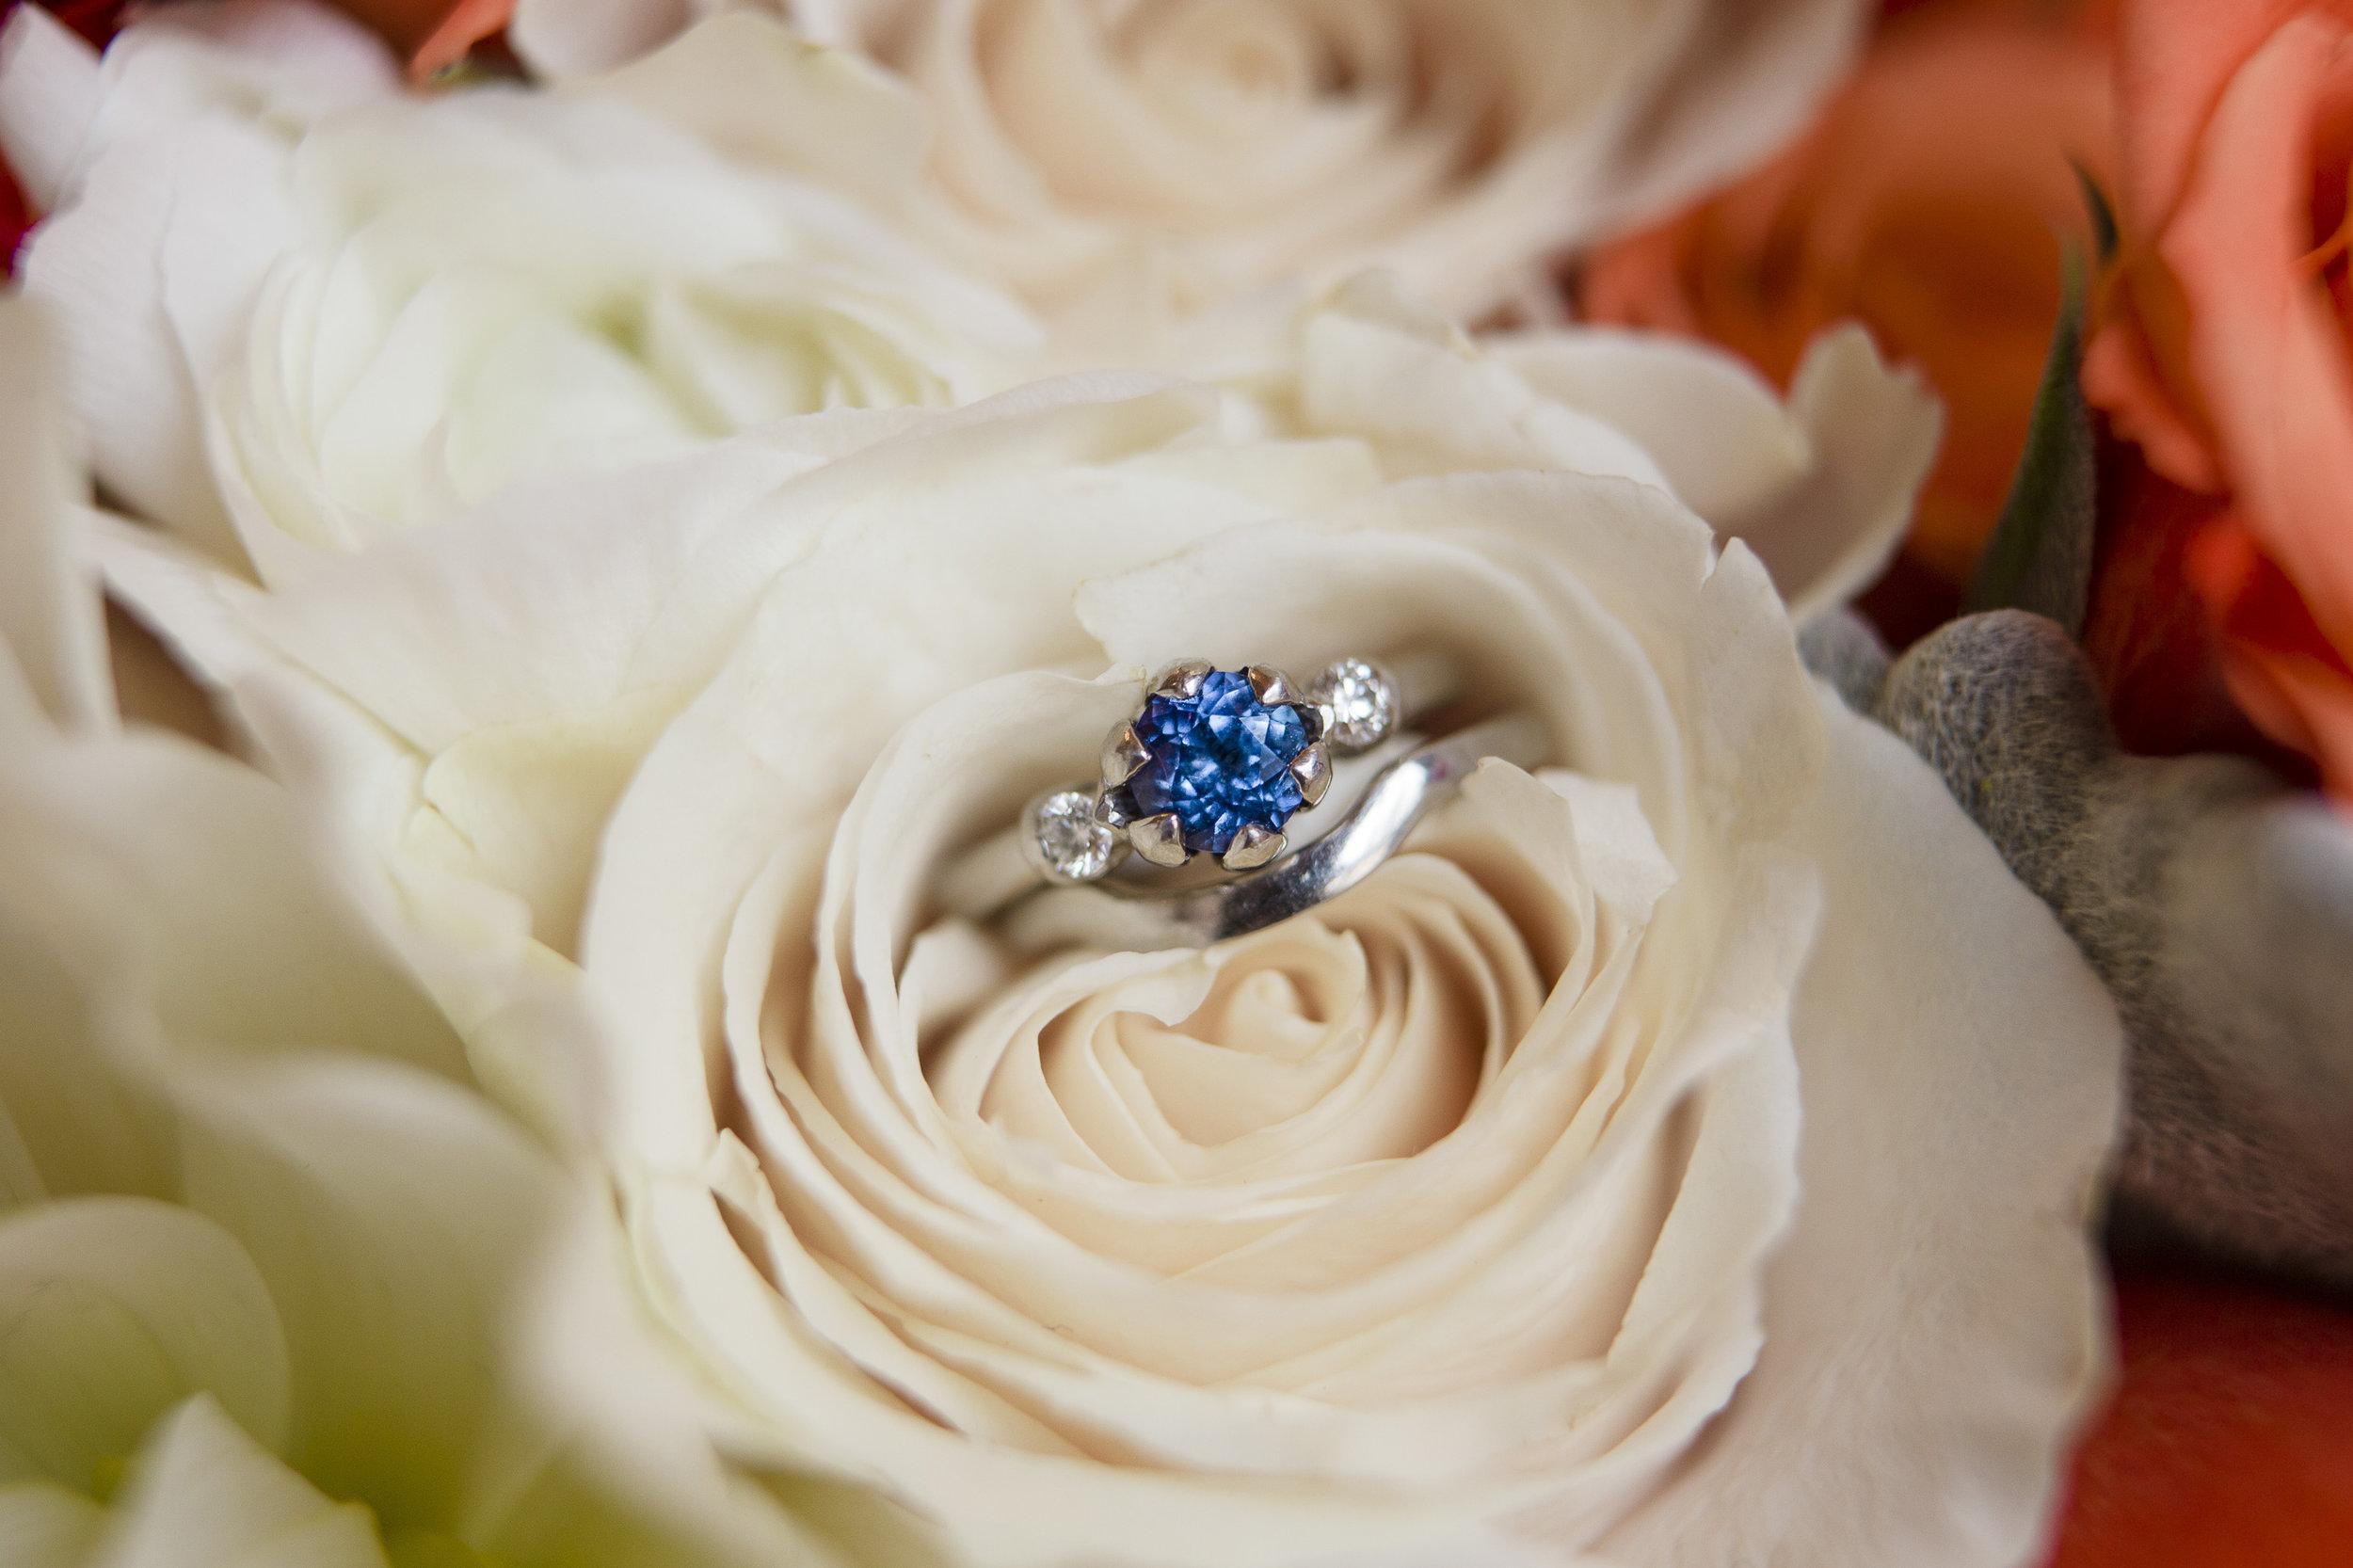 kristen-vance-fraser-colorado-winter-wedding-sapphire-ring-2017.jpg